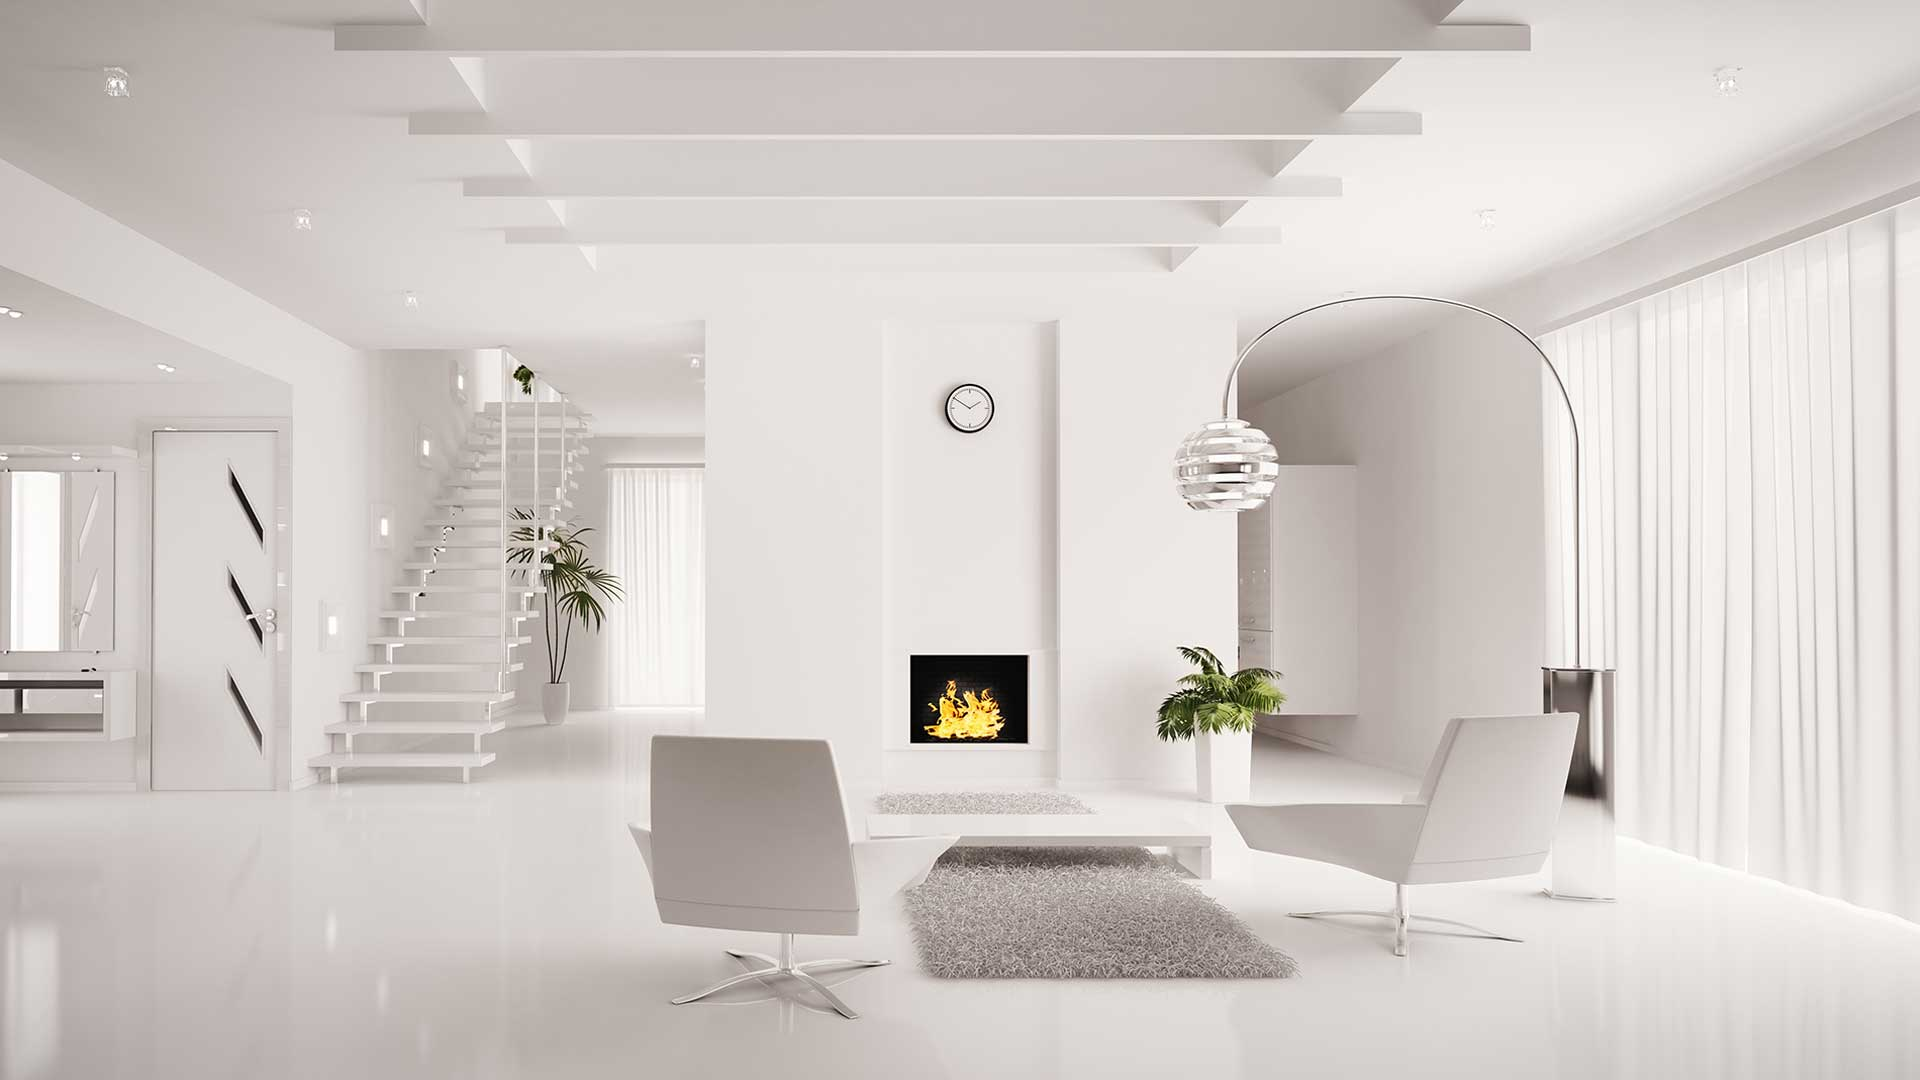 Missouri City Residential Real Estate Inspector